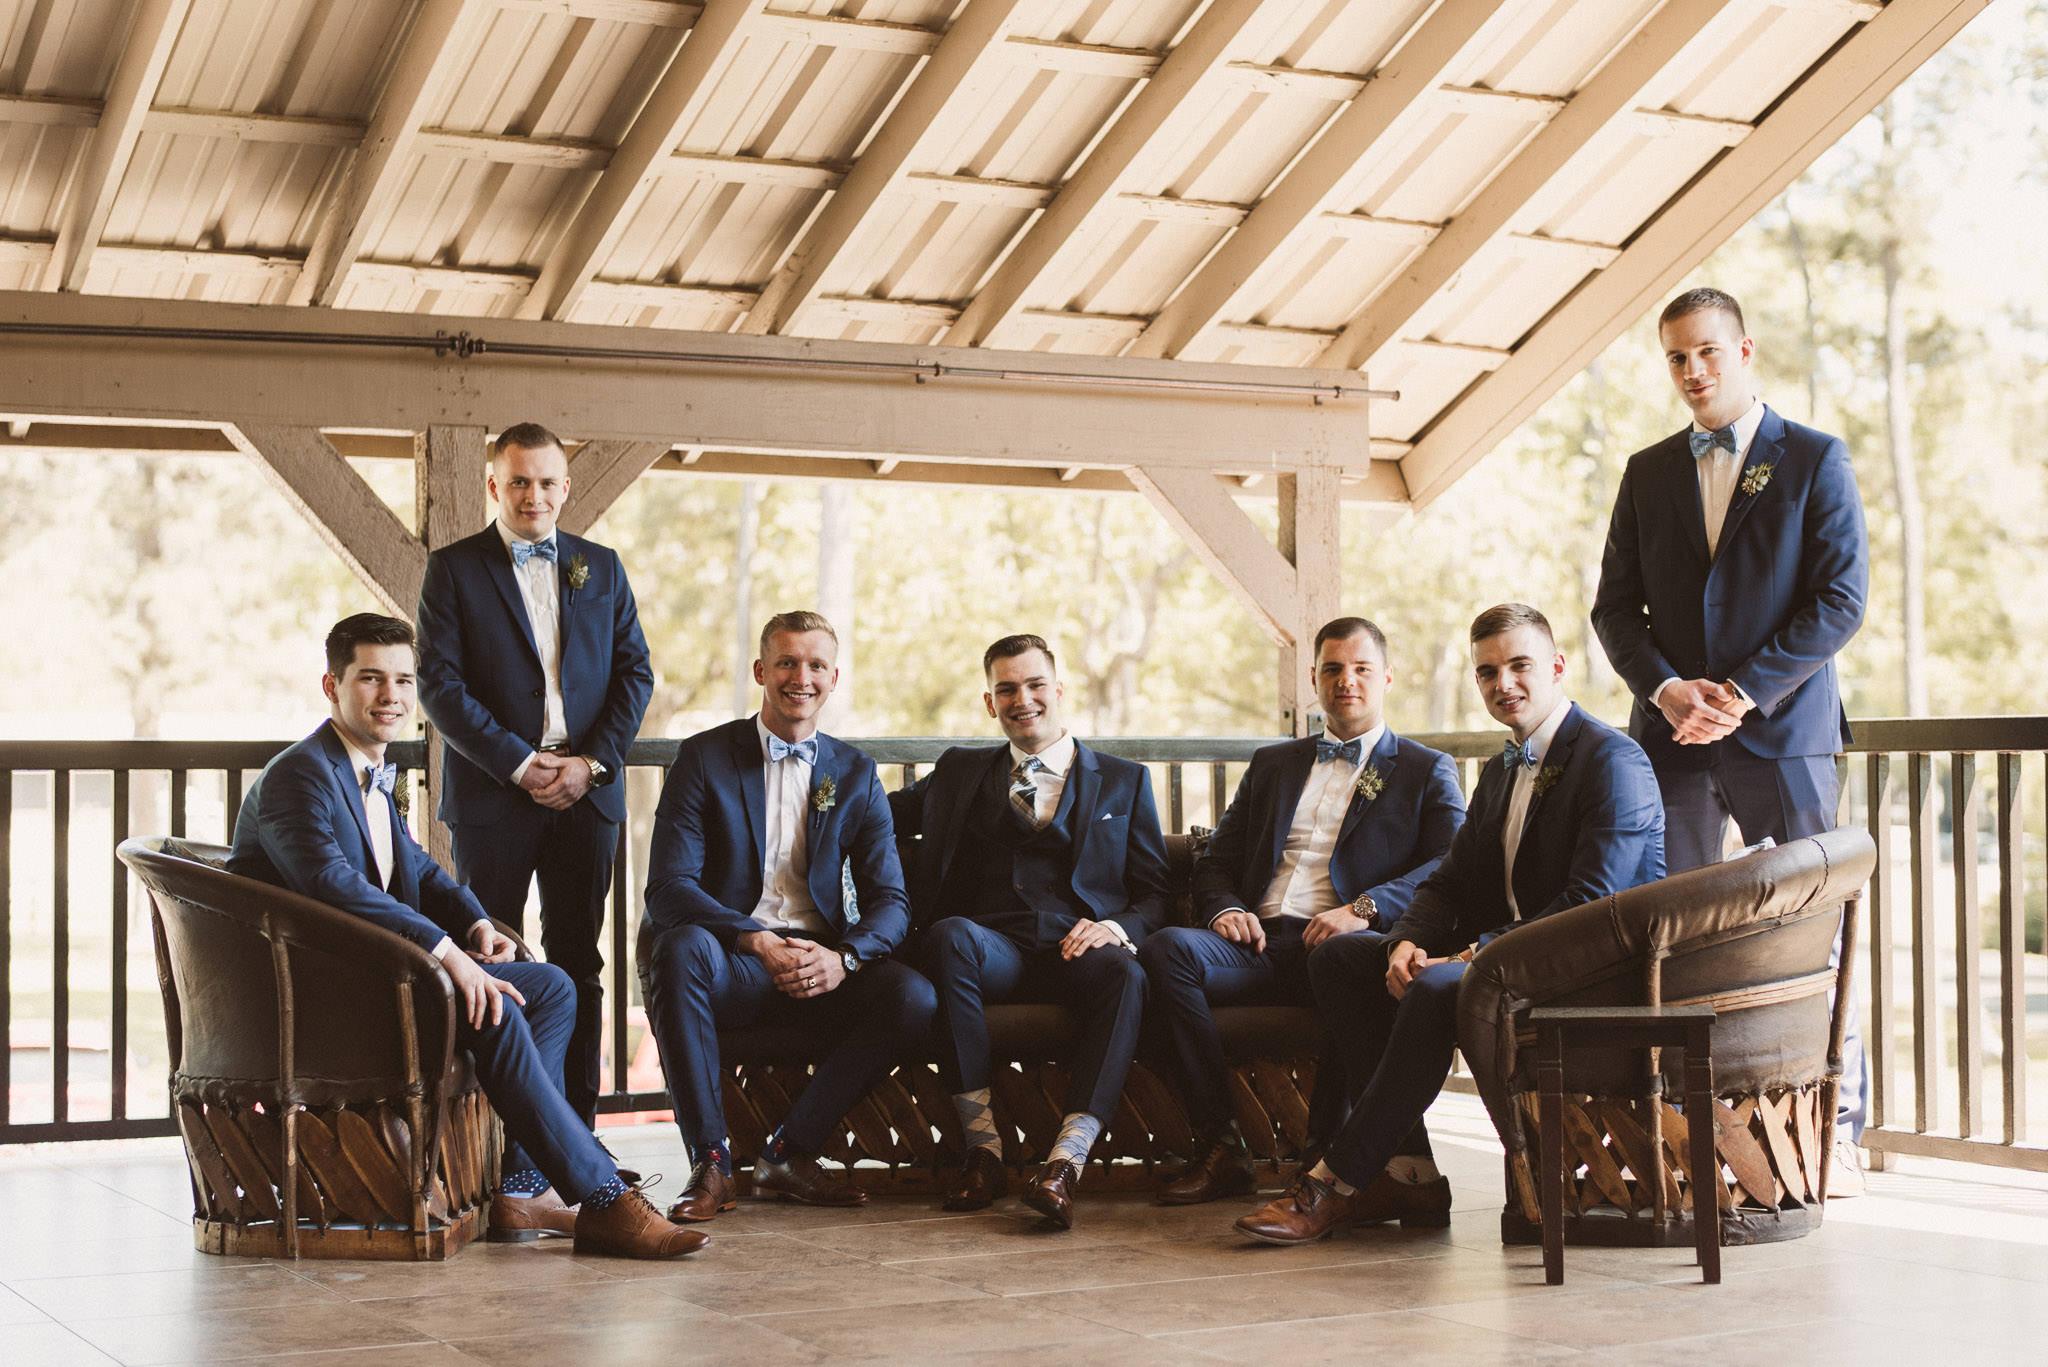 madera-estates-conroe-houston-wedding-venue-resort-photographer-bride